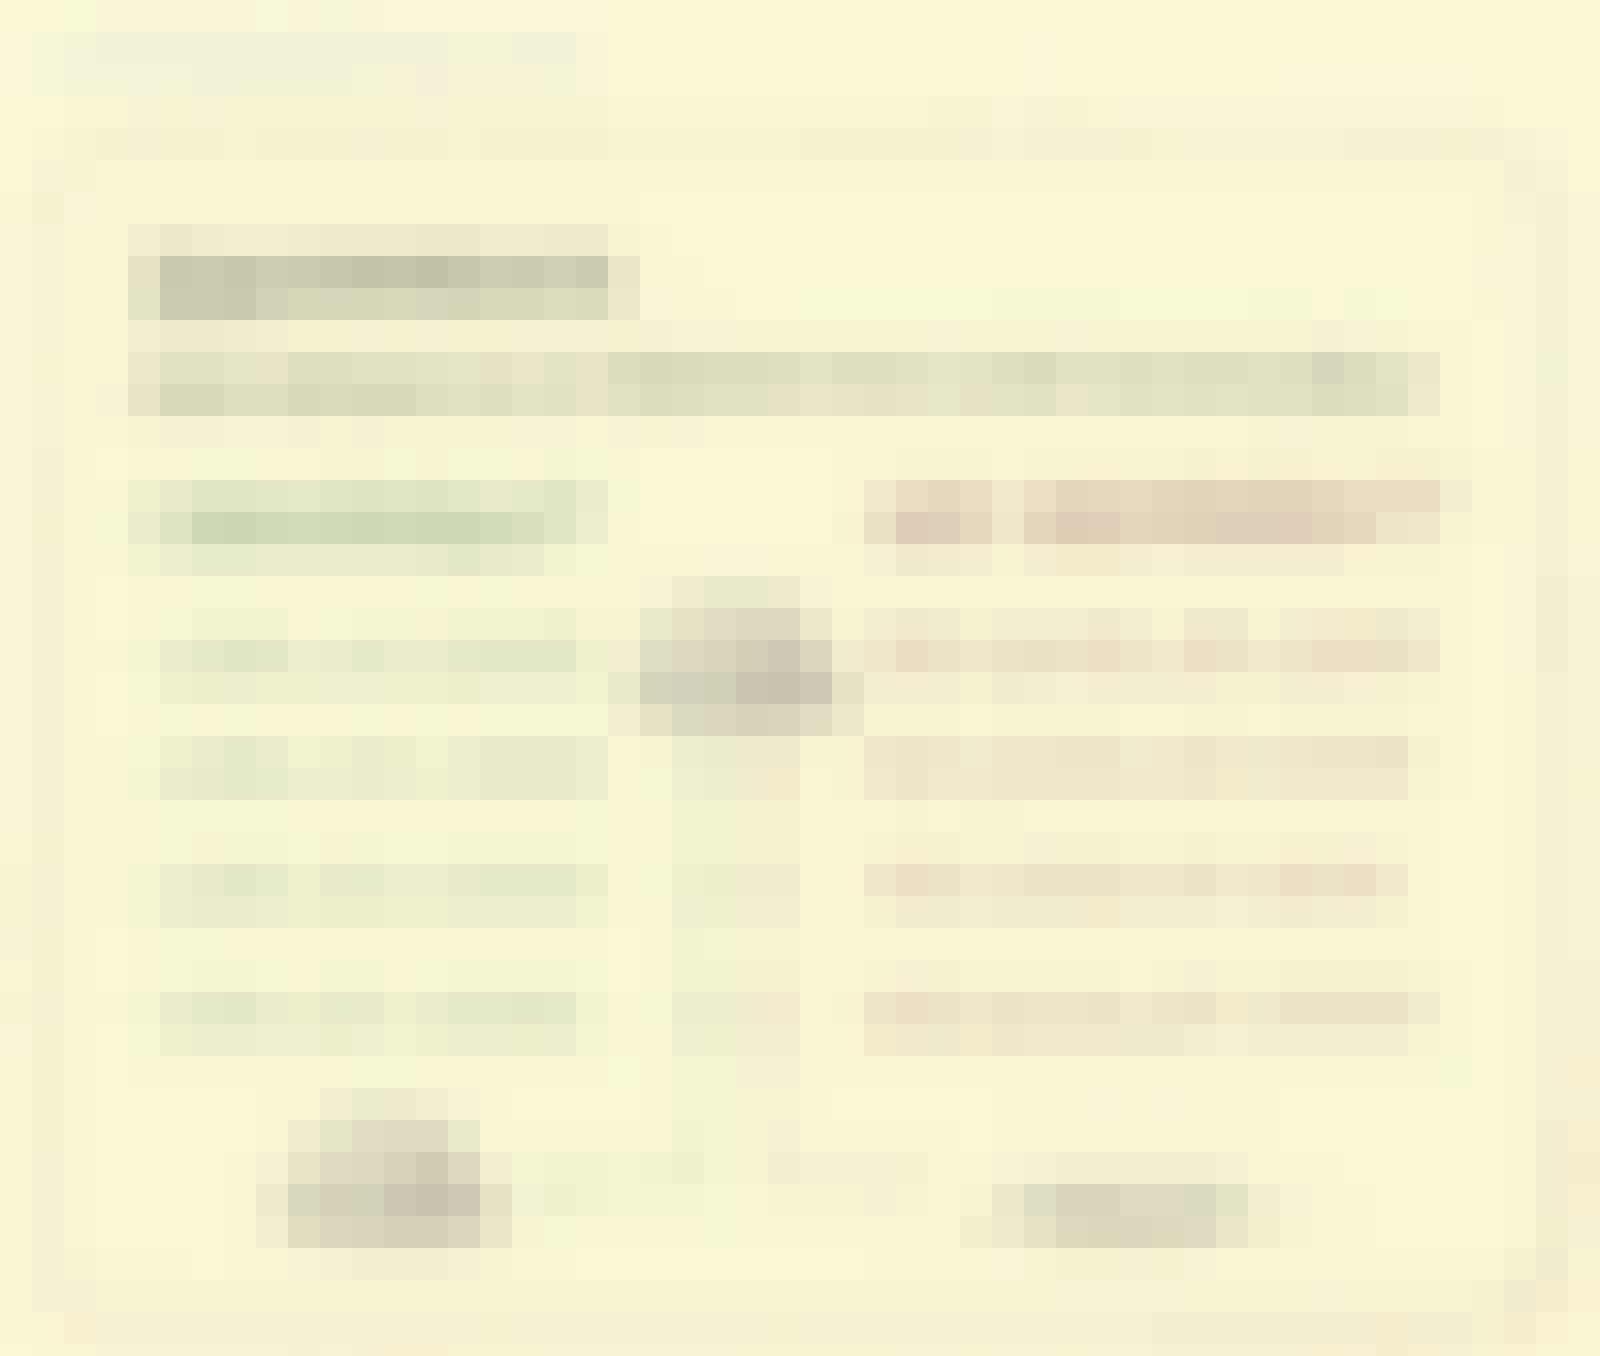 Idempotence - Sketchplanations